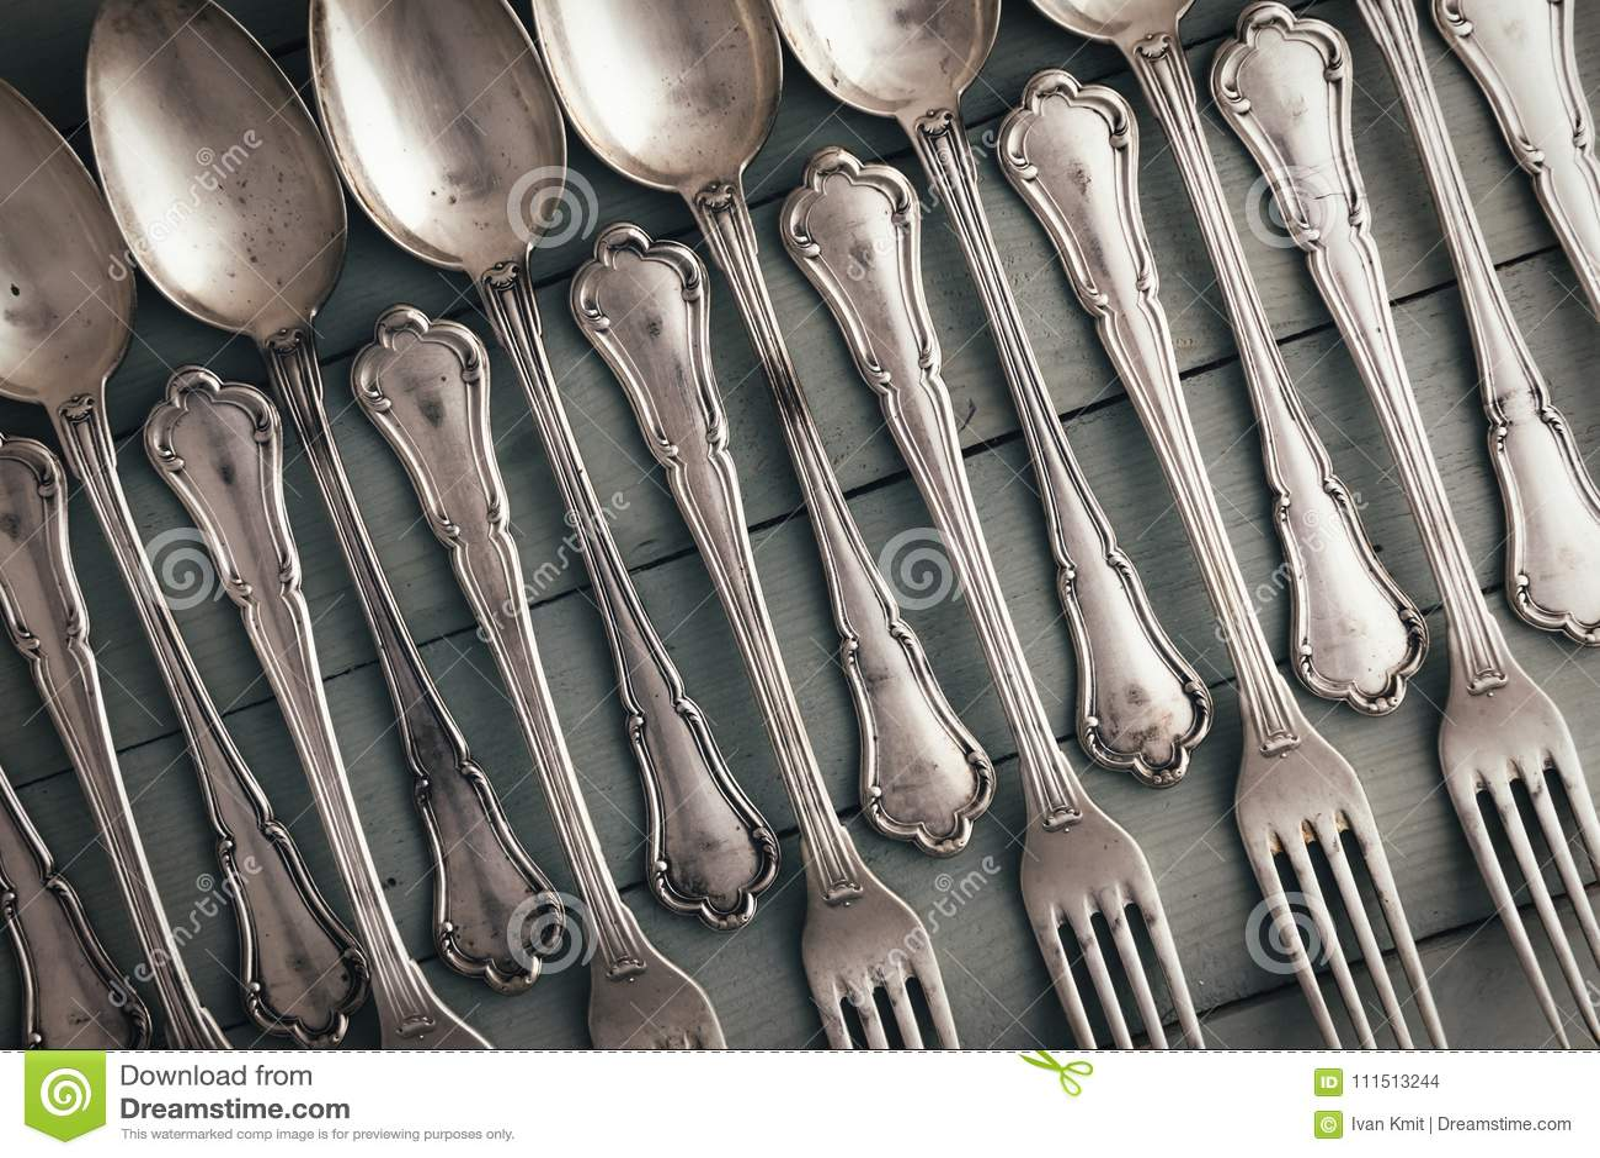 Set Of Antique Silverware Stock Photo Image Of Food